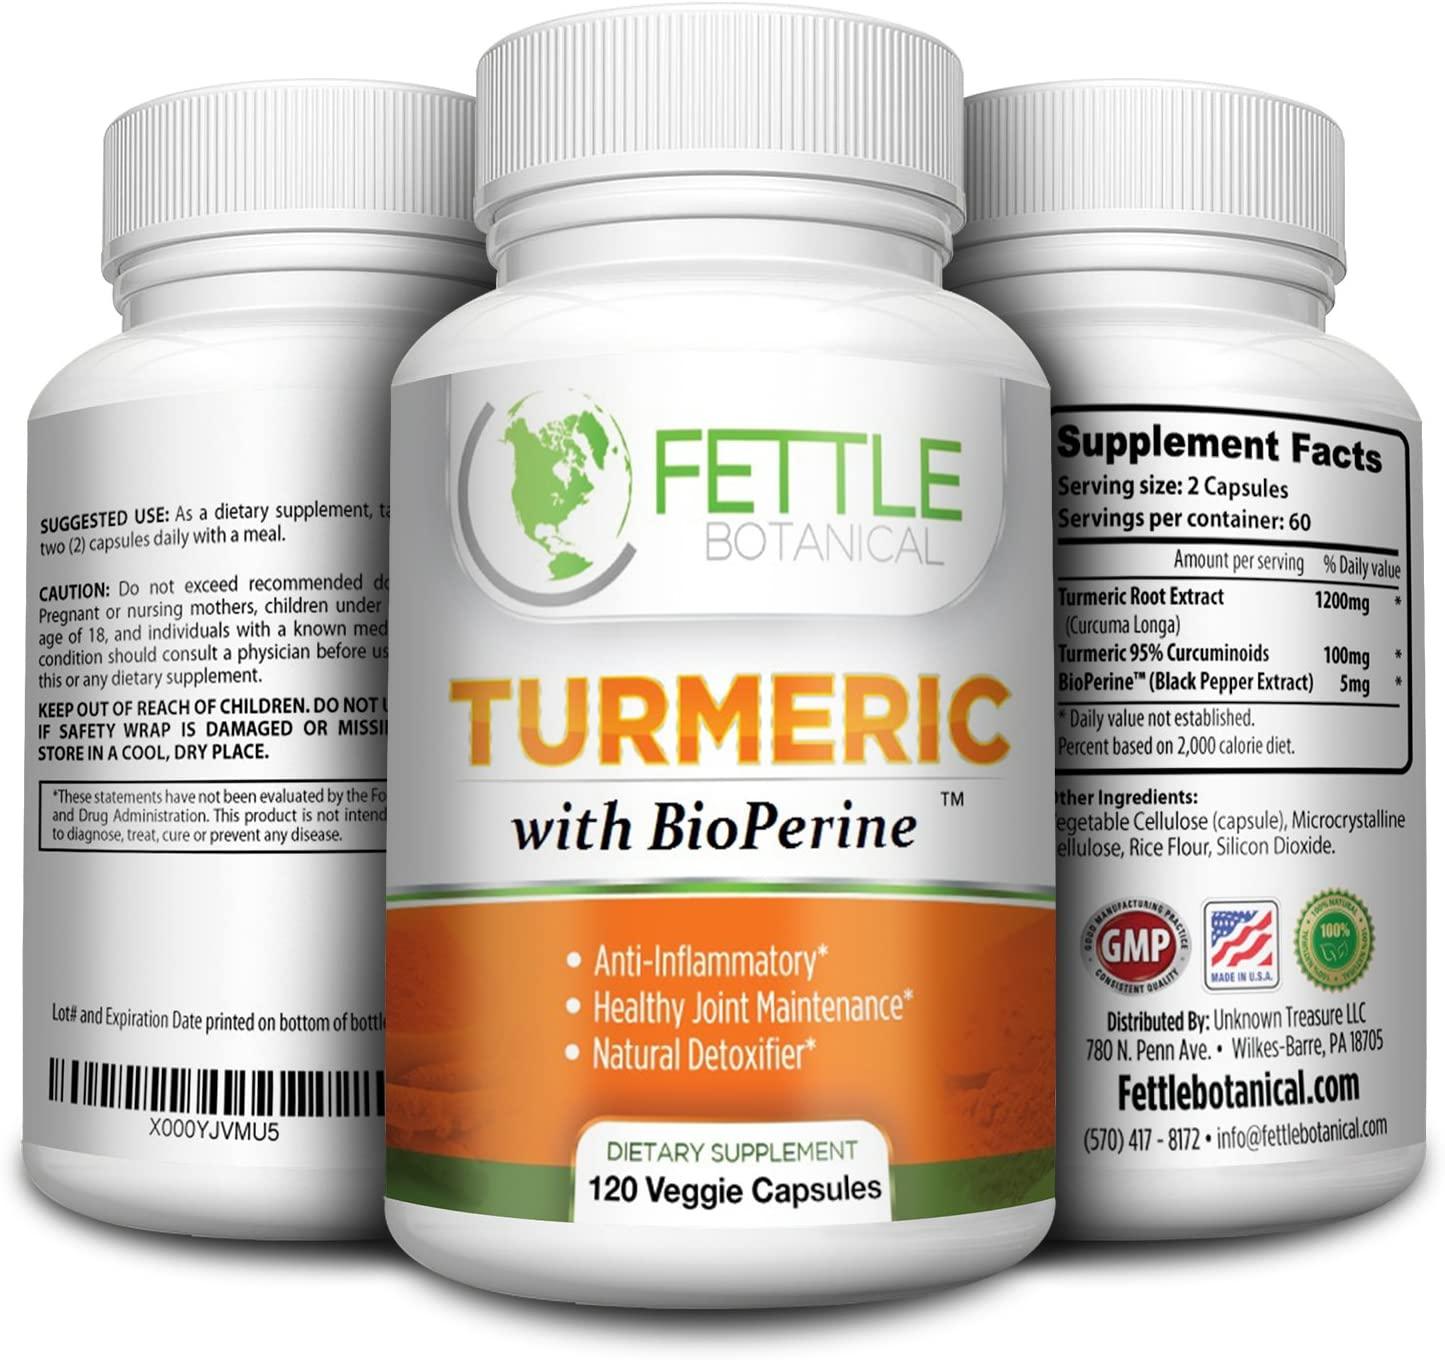 Tumeric Curcumin with Bioperine 1300mg Daily Dose 120 Caps Black Pepper Extract Piperine Tumerics Turmeric Supplements Natural Antioxidant Veggie Capsules Curcuma Longa Supplement Fettle Botanical